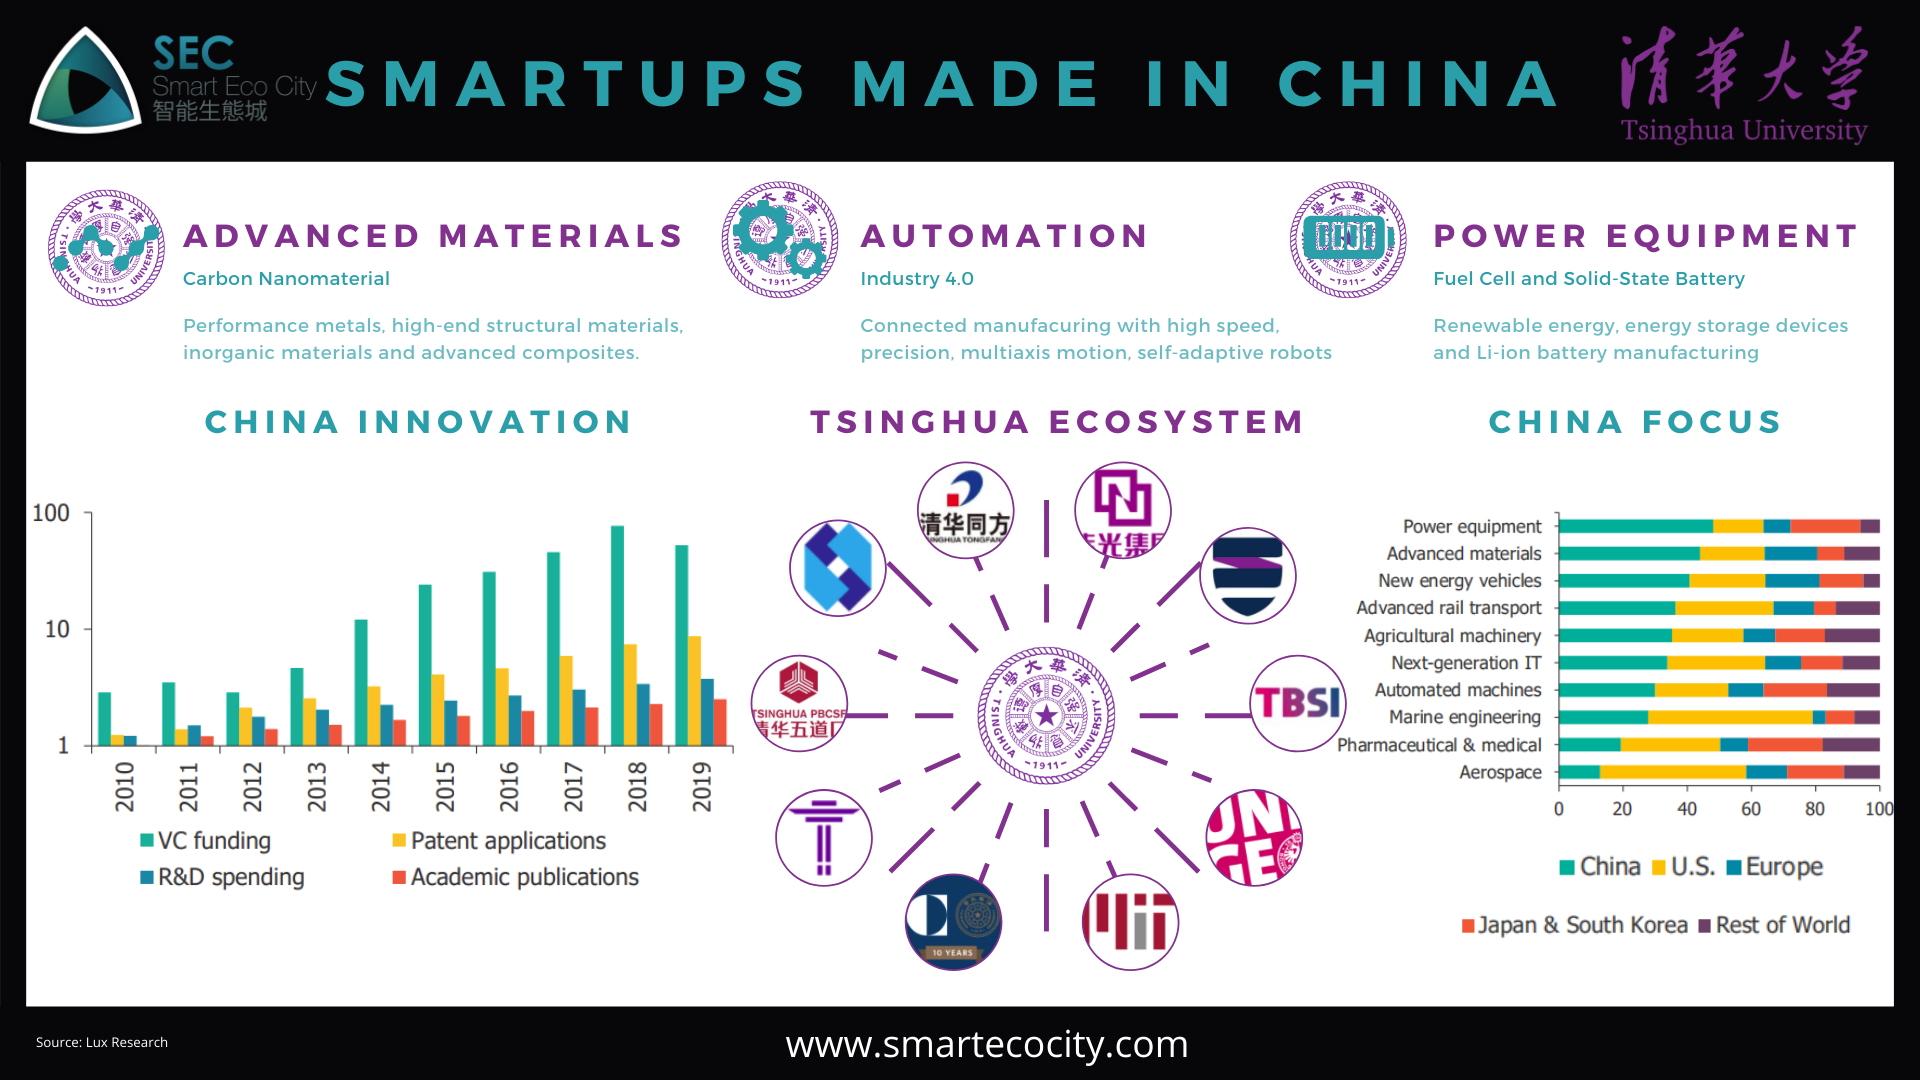 SEC_Tsinghua_Smartups made in China